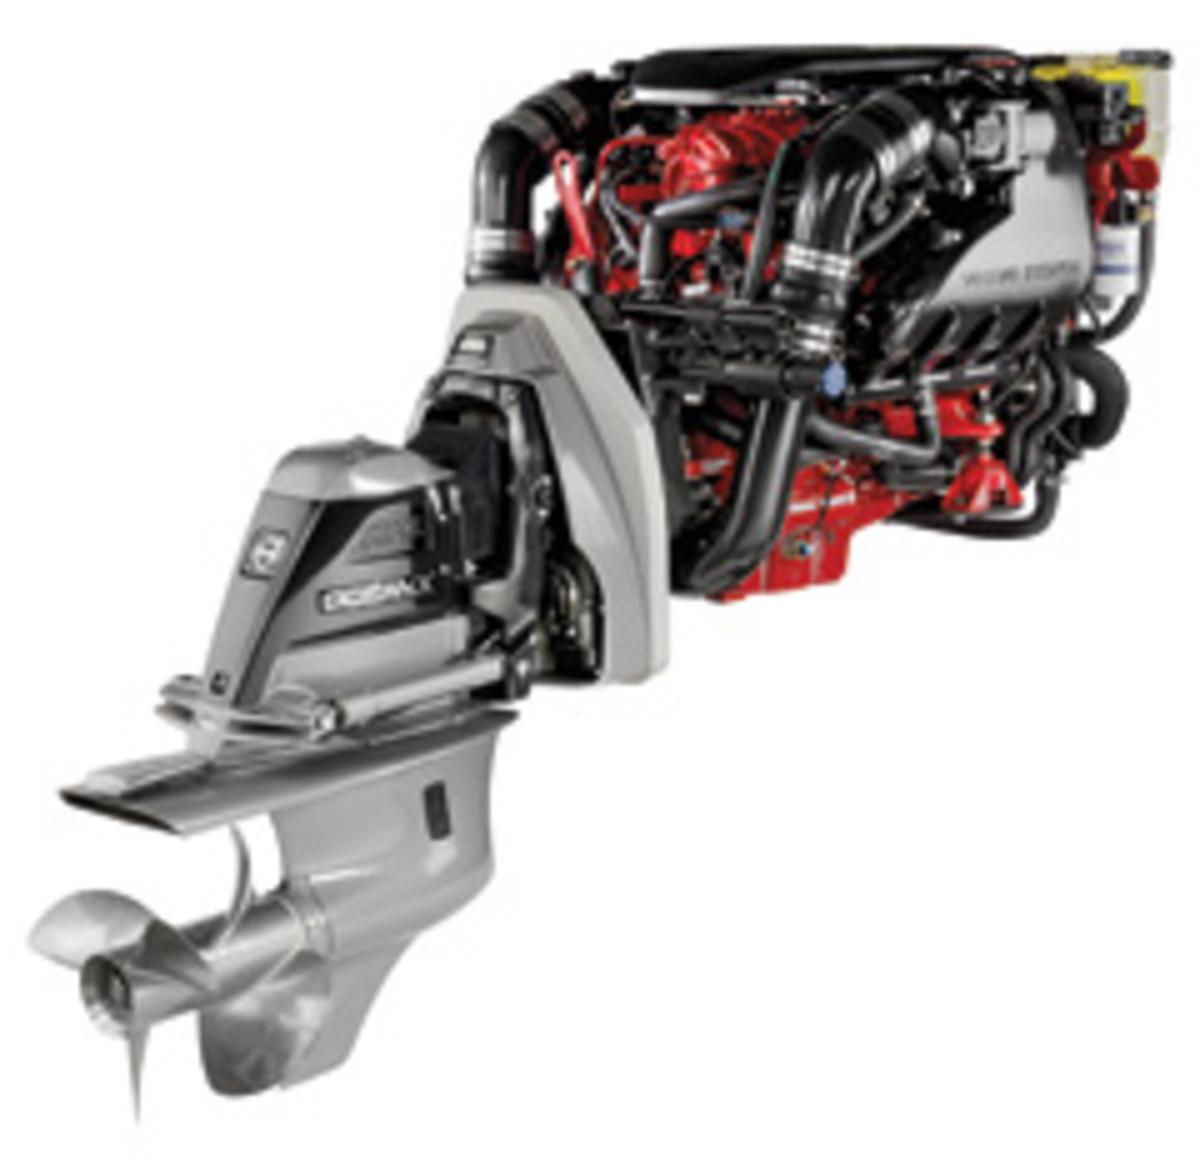 Volvo Penta V8-360 gas sterndrive